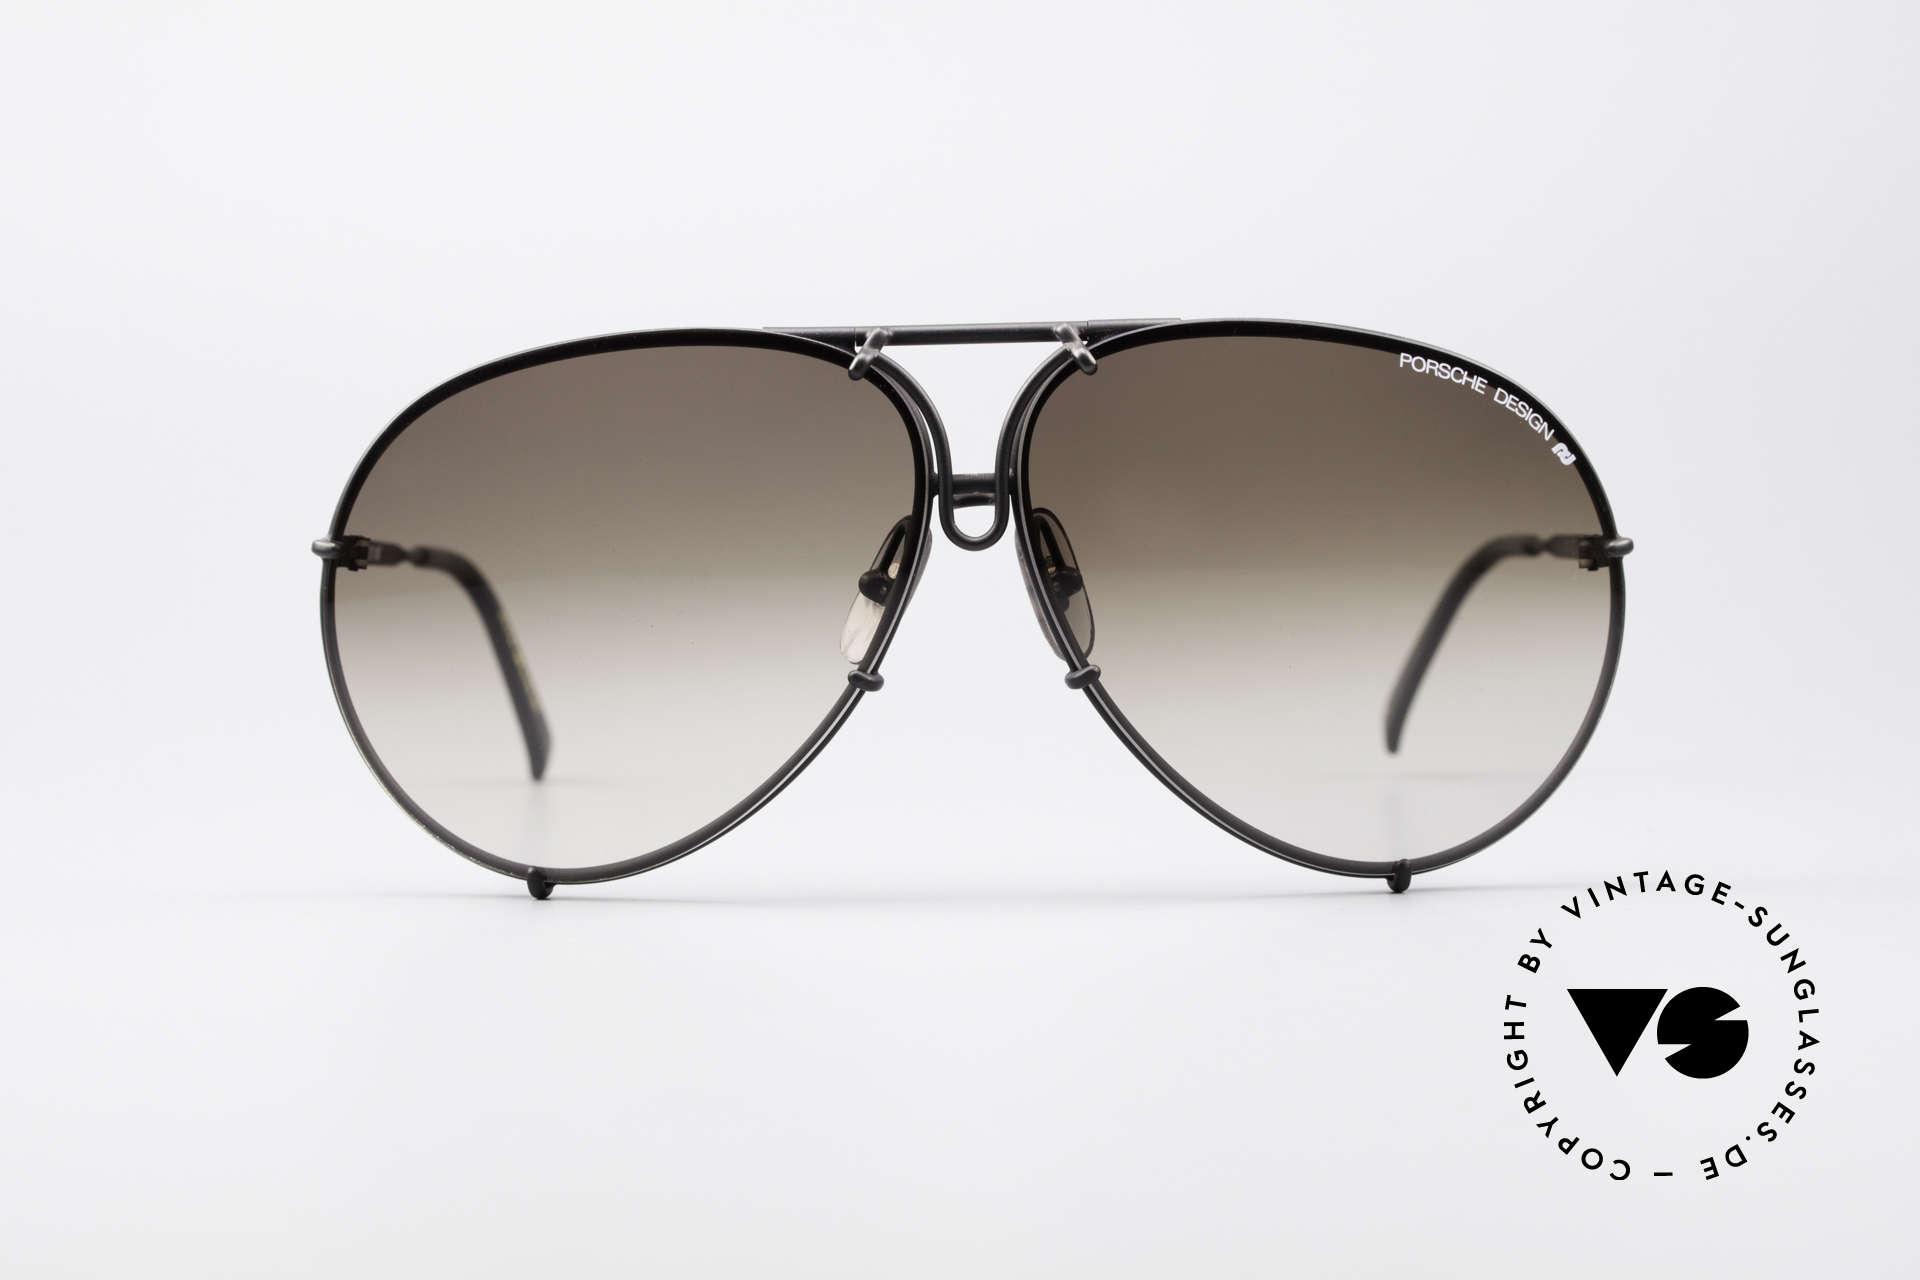 dff15e3a0f Sunglasses Porsche 5621 Large 80 s Aviator Shades